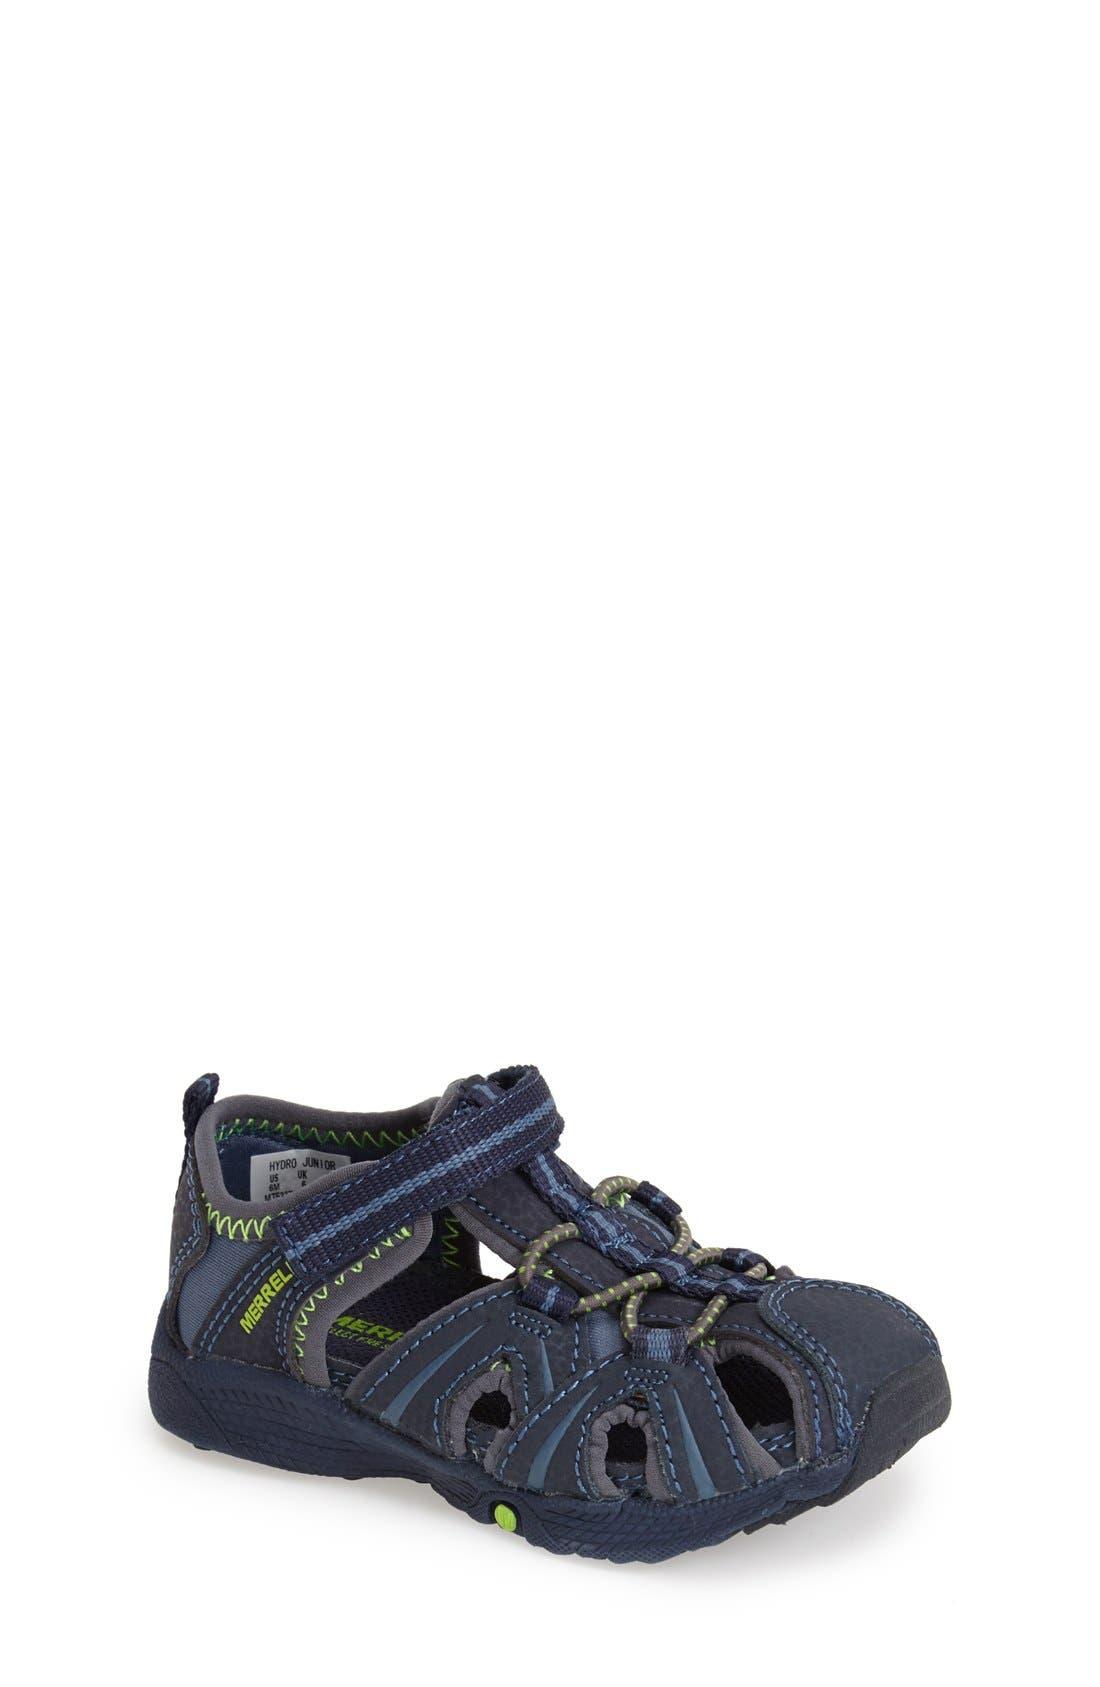 MERRELL 'Hydro Junior' M-Select Water Sandal, Main, color, NAVY/ GREEN